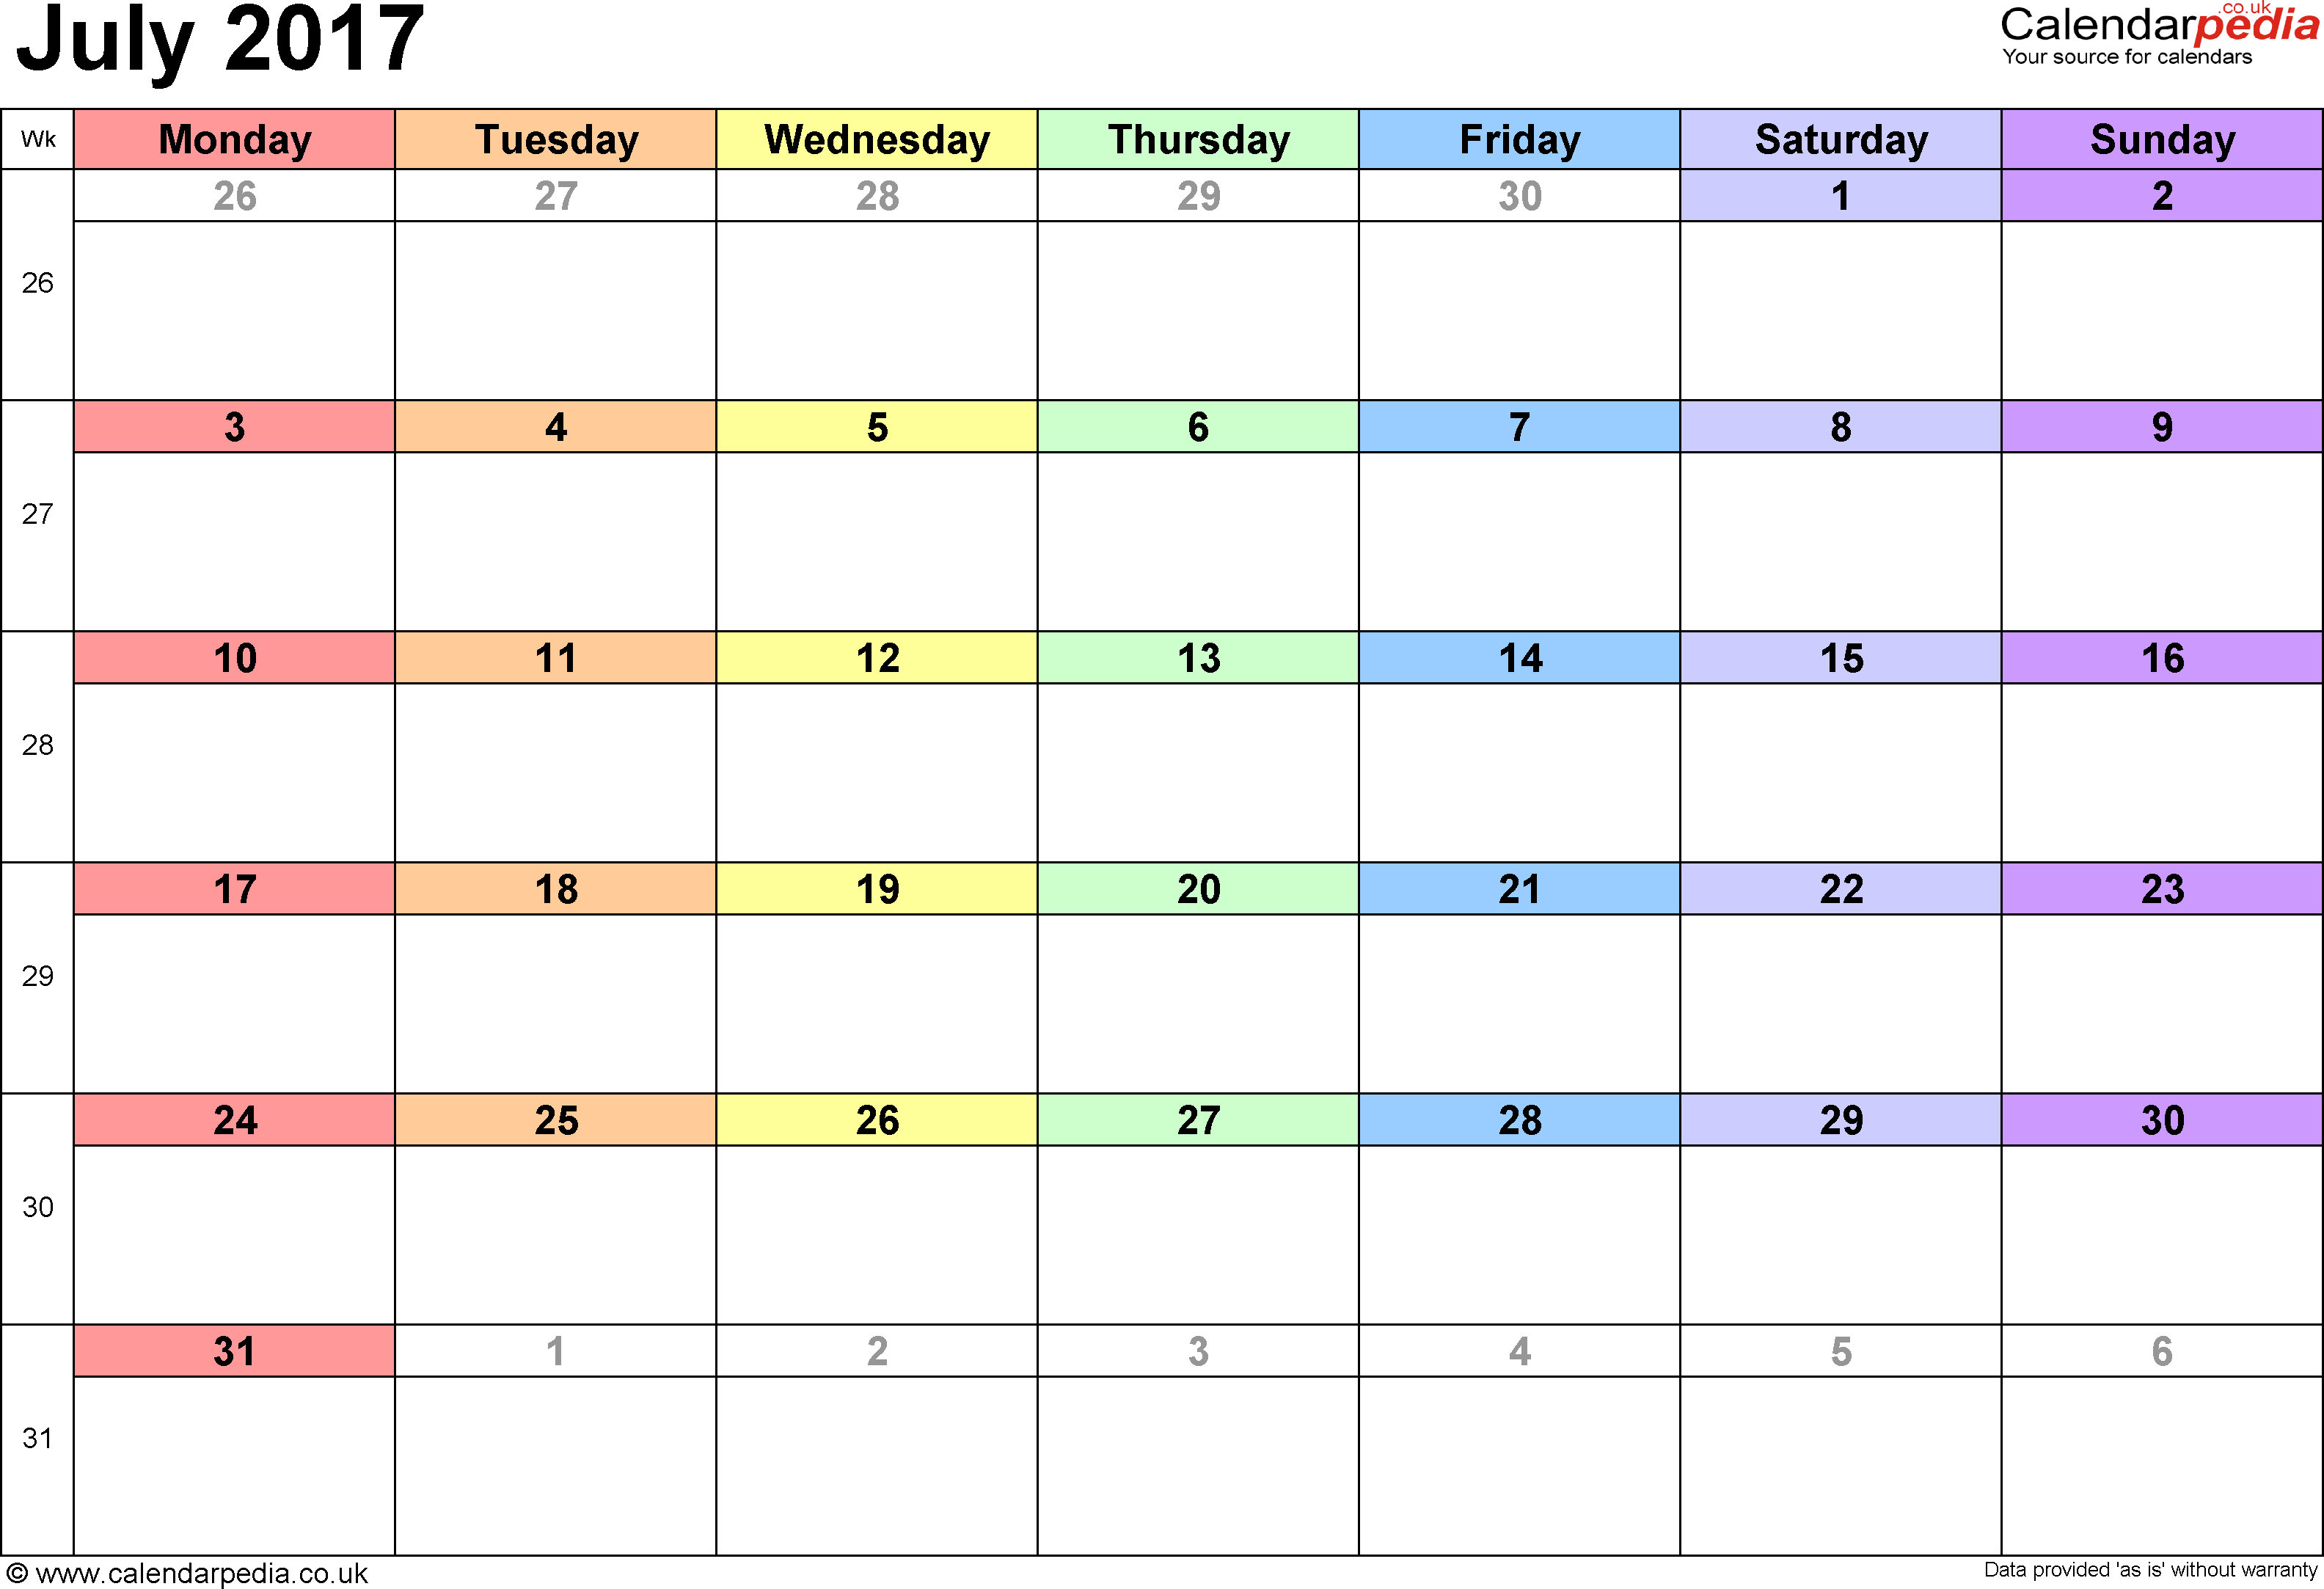 Calendar July 2017 UK, Bank Holidays, Excel/PDF/Word Templates